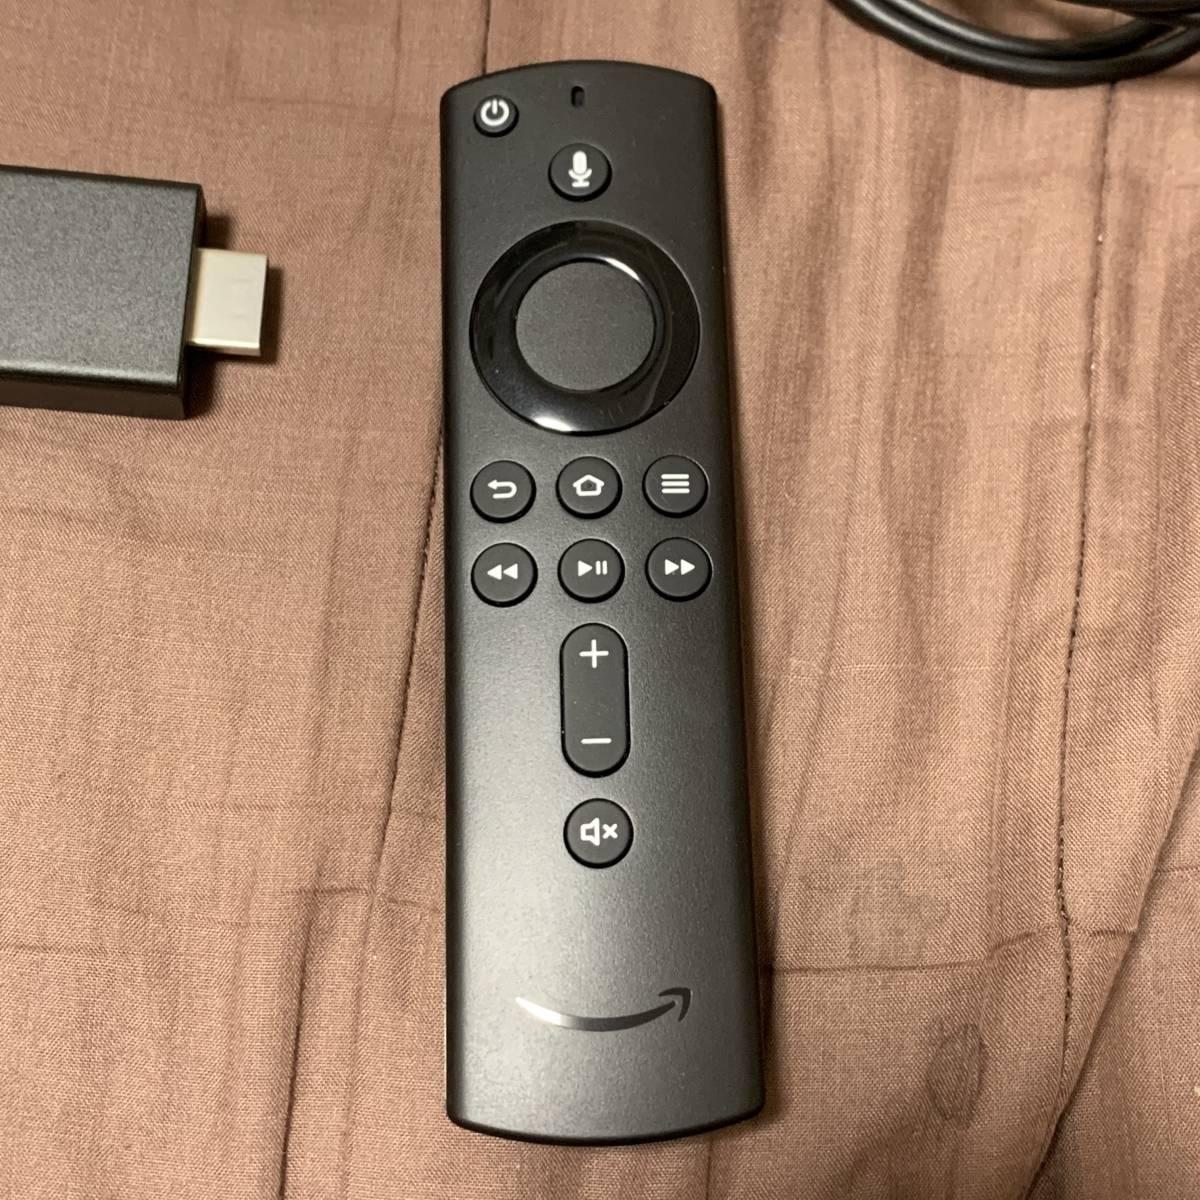 Amazon 新登場 Fire TV Stick - Alexa対応音声認識リモコン付属 ファイアー ティービー スティック アクセラ対応_画像5